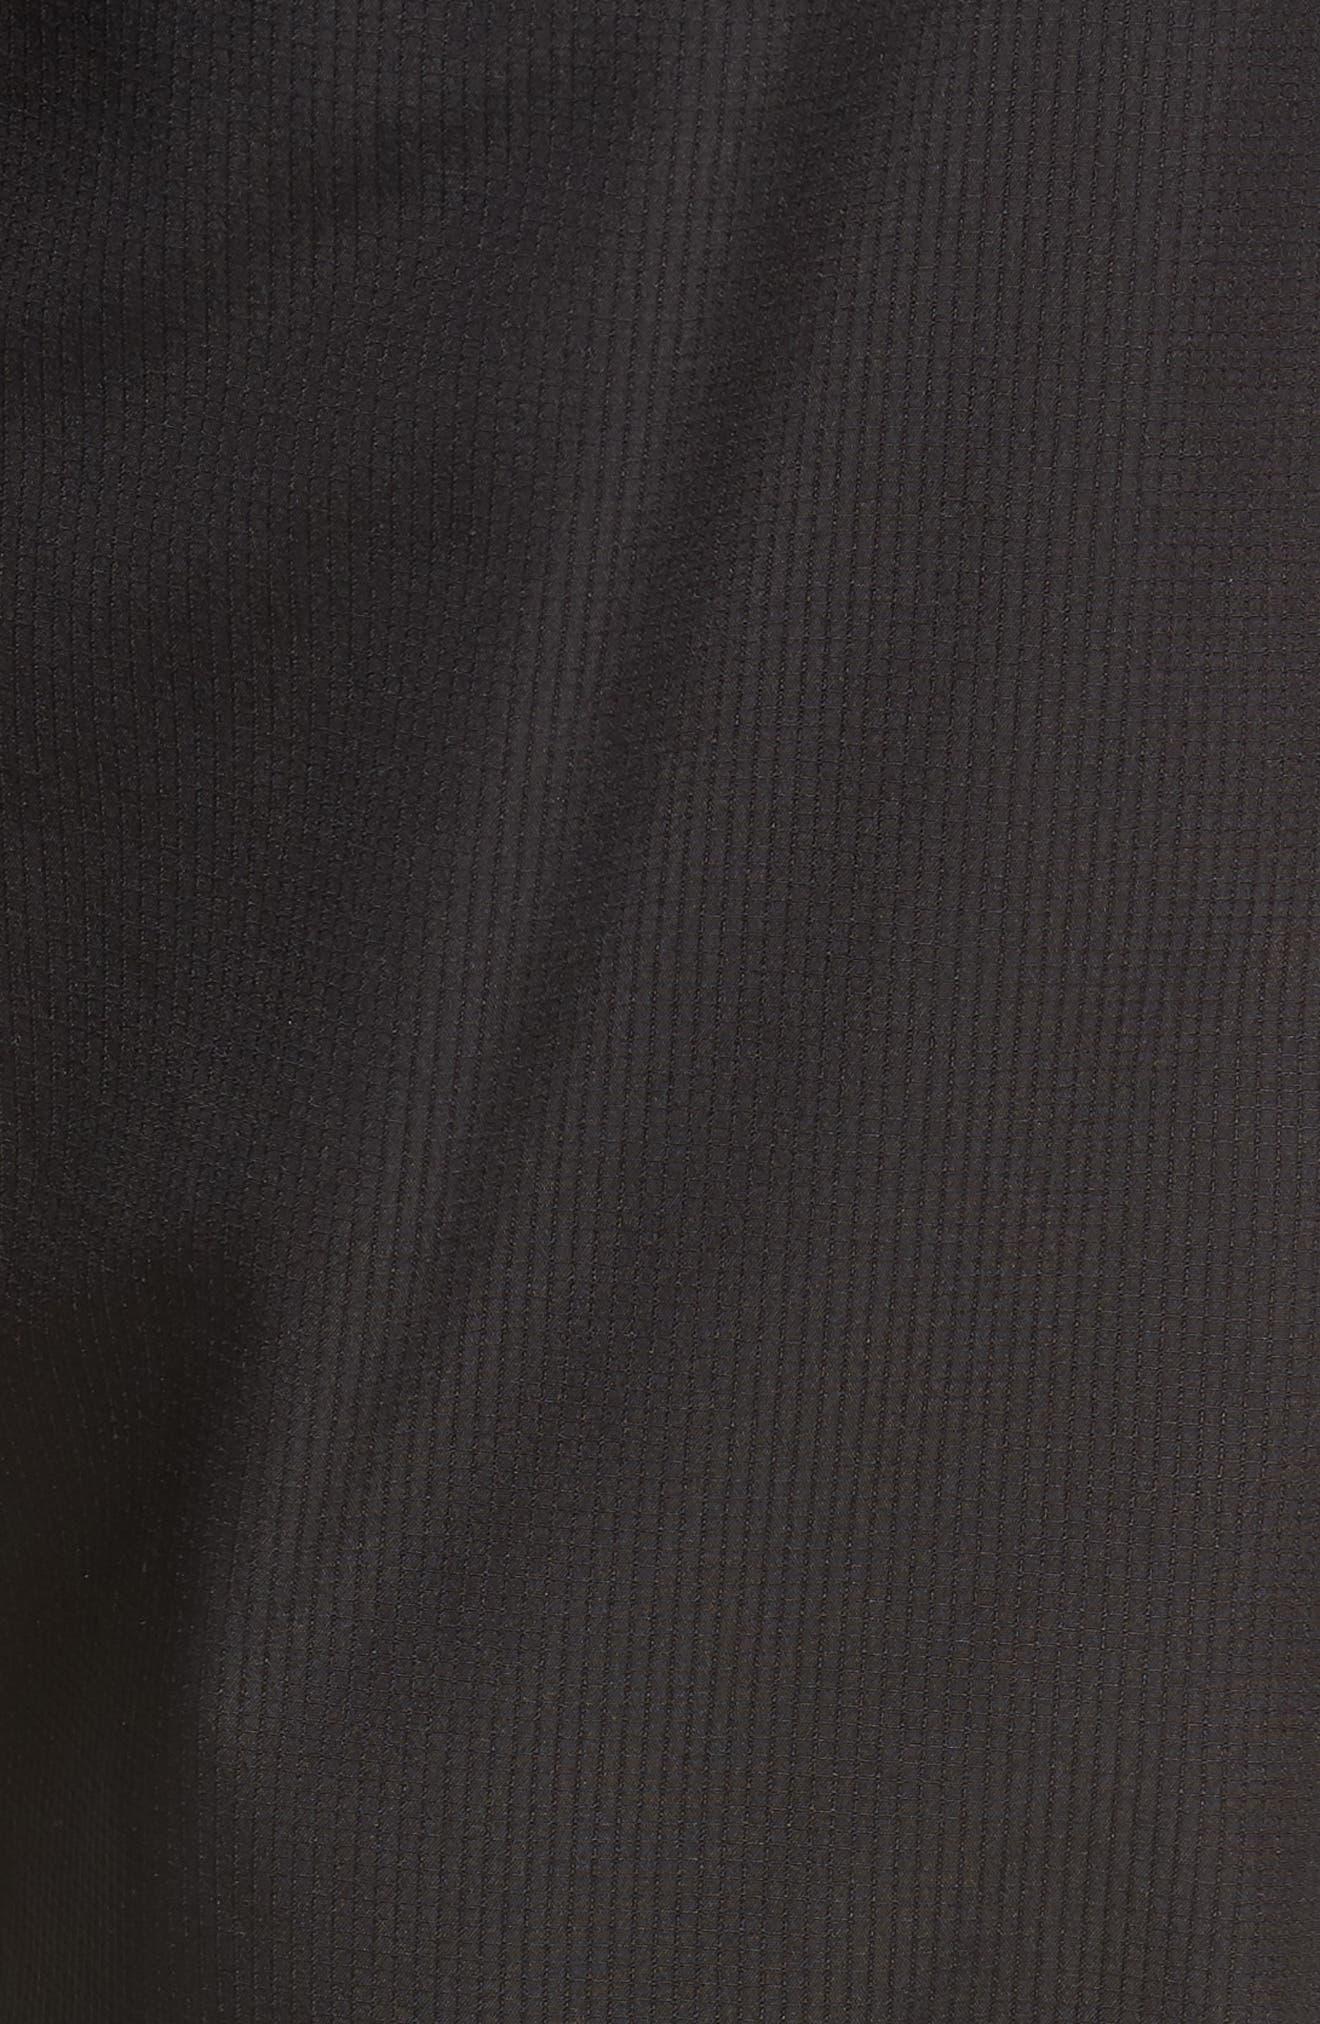 Authentics Track Pants,                             Alternate thumbnail 5, color,                             BLACK/ WHITE